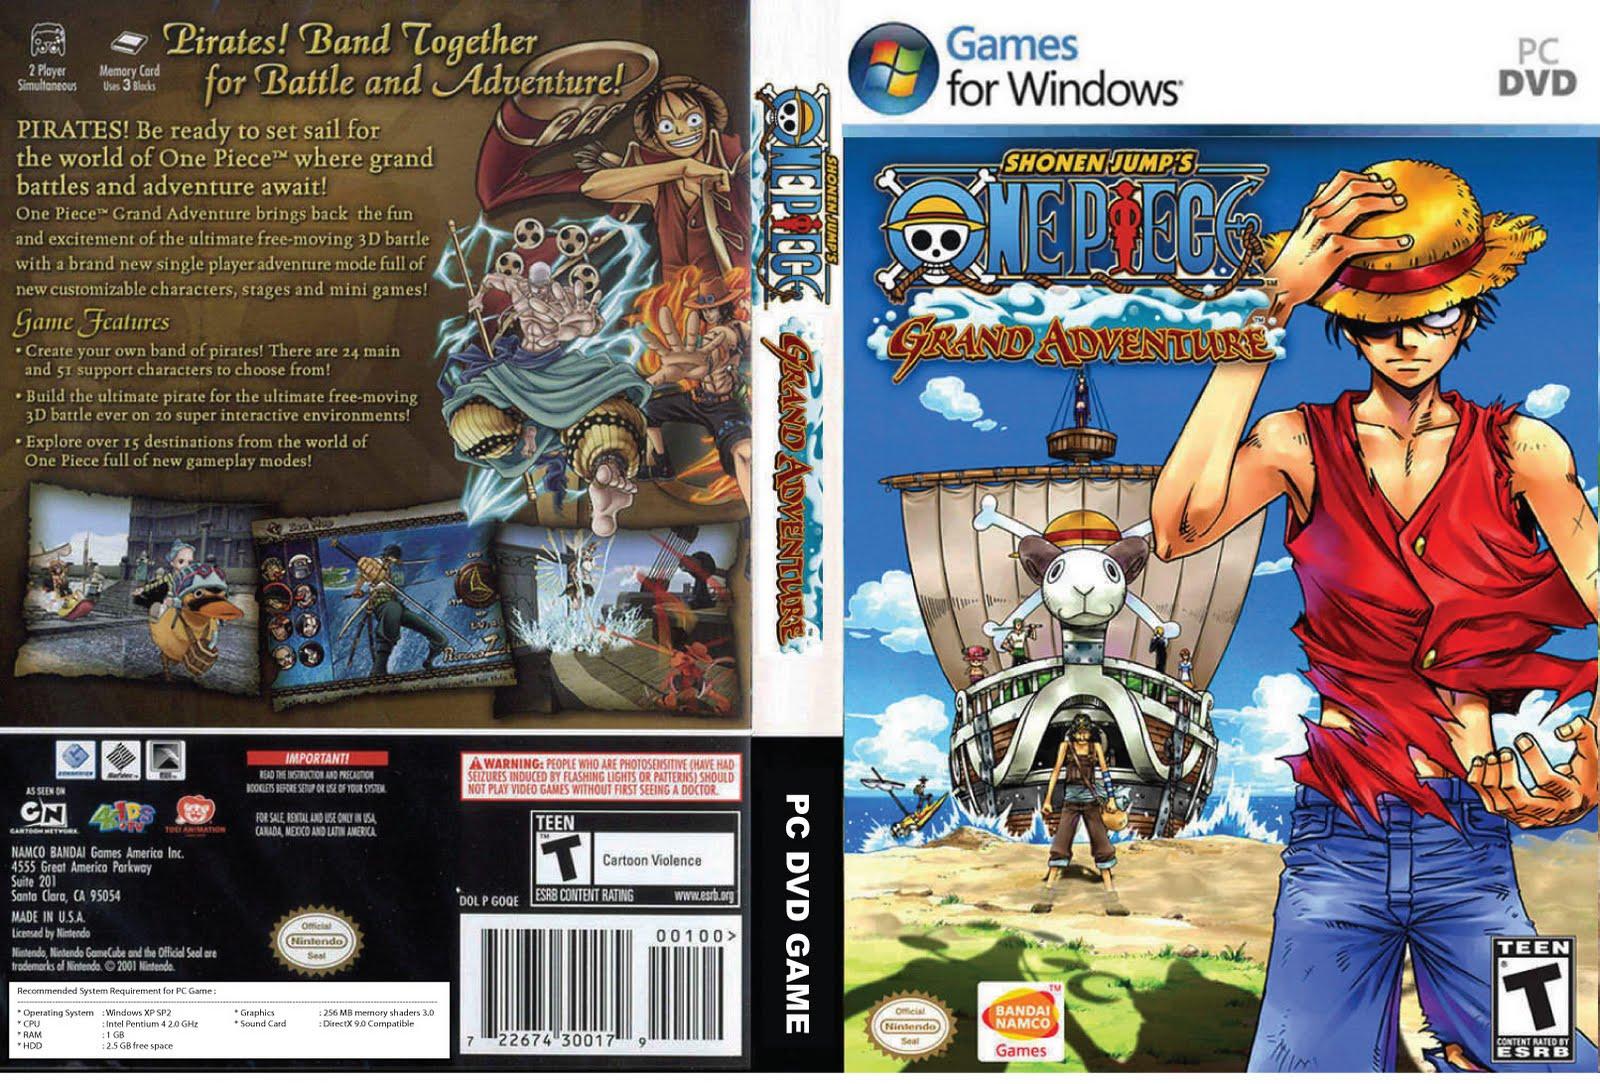 One Piece Grand Battle Adventure PC game